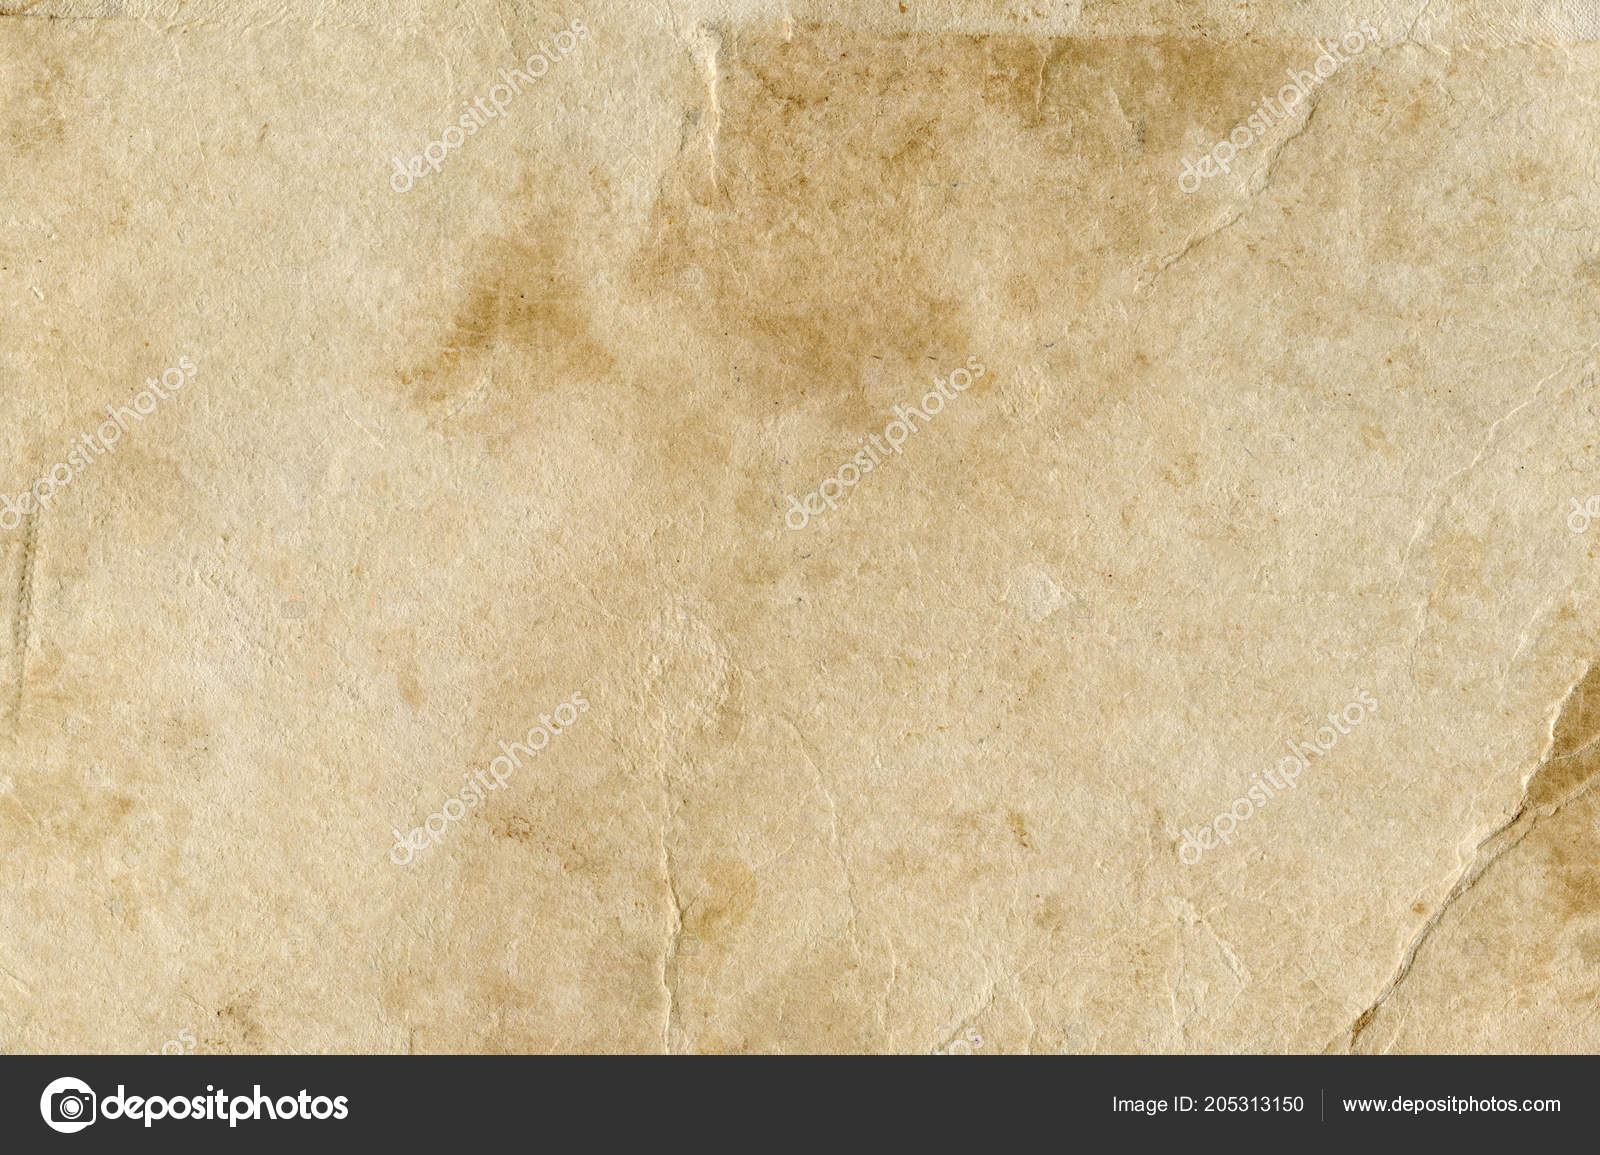 High Resolution Parchment Texture Res Grunge Paper Texture